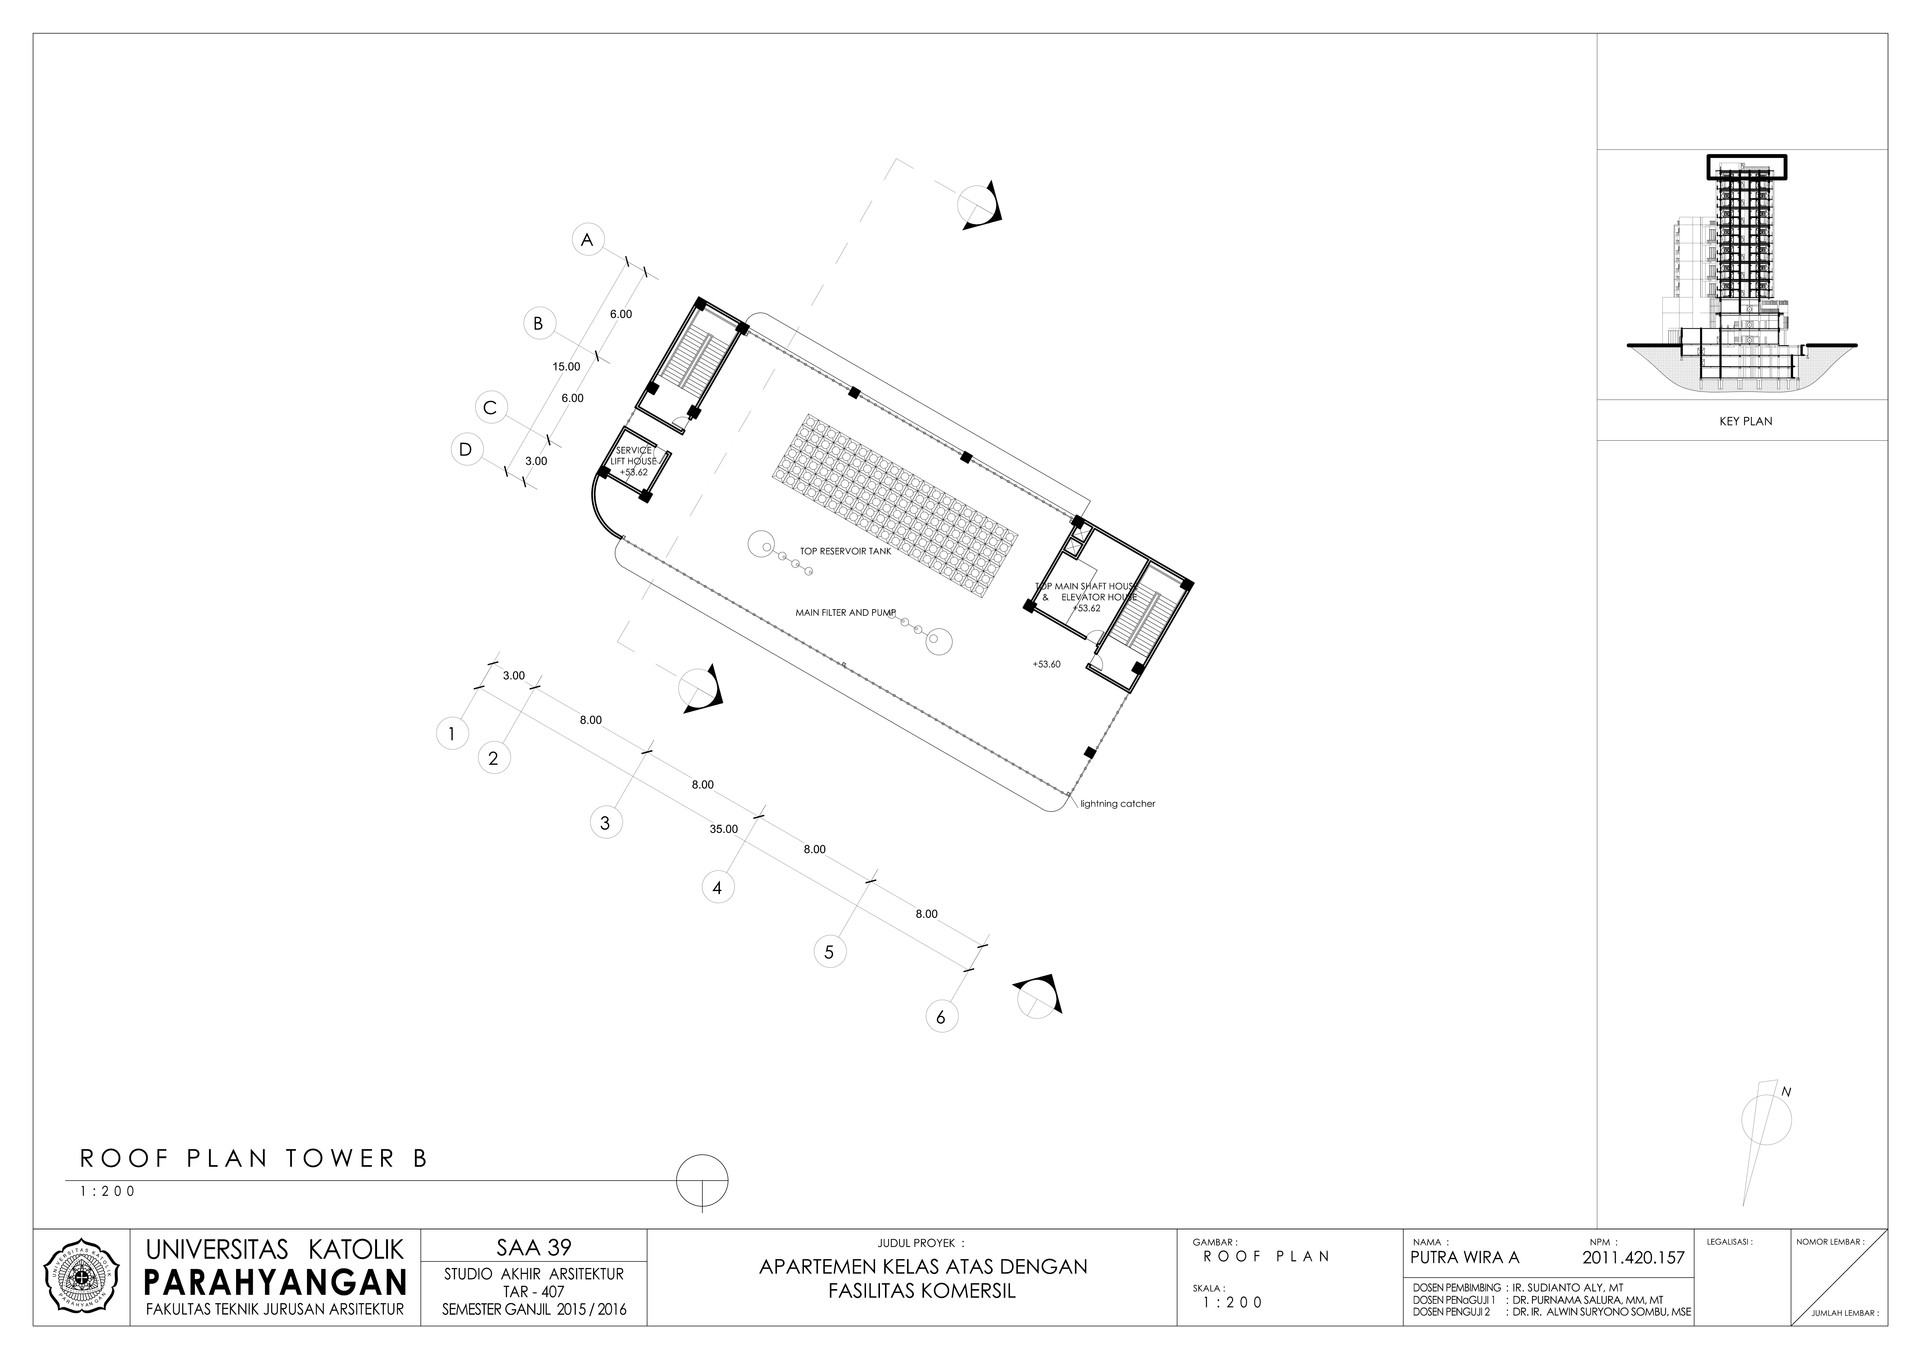 Putra wira adhiprajna 4 roof floor b